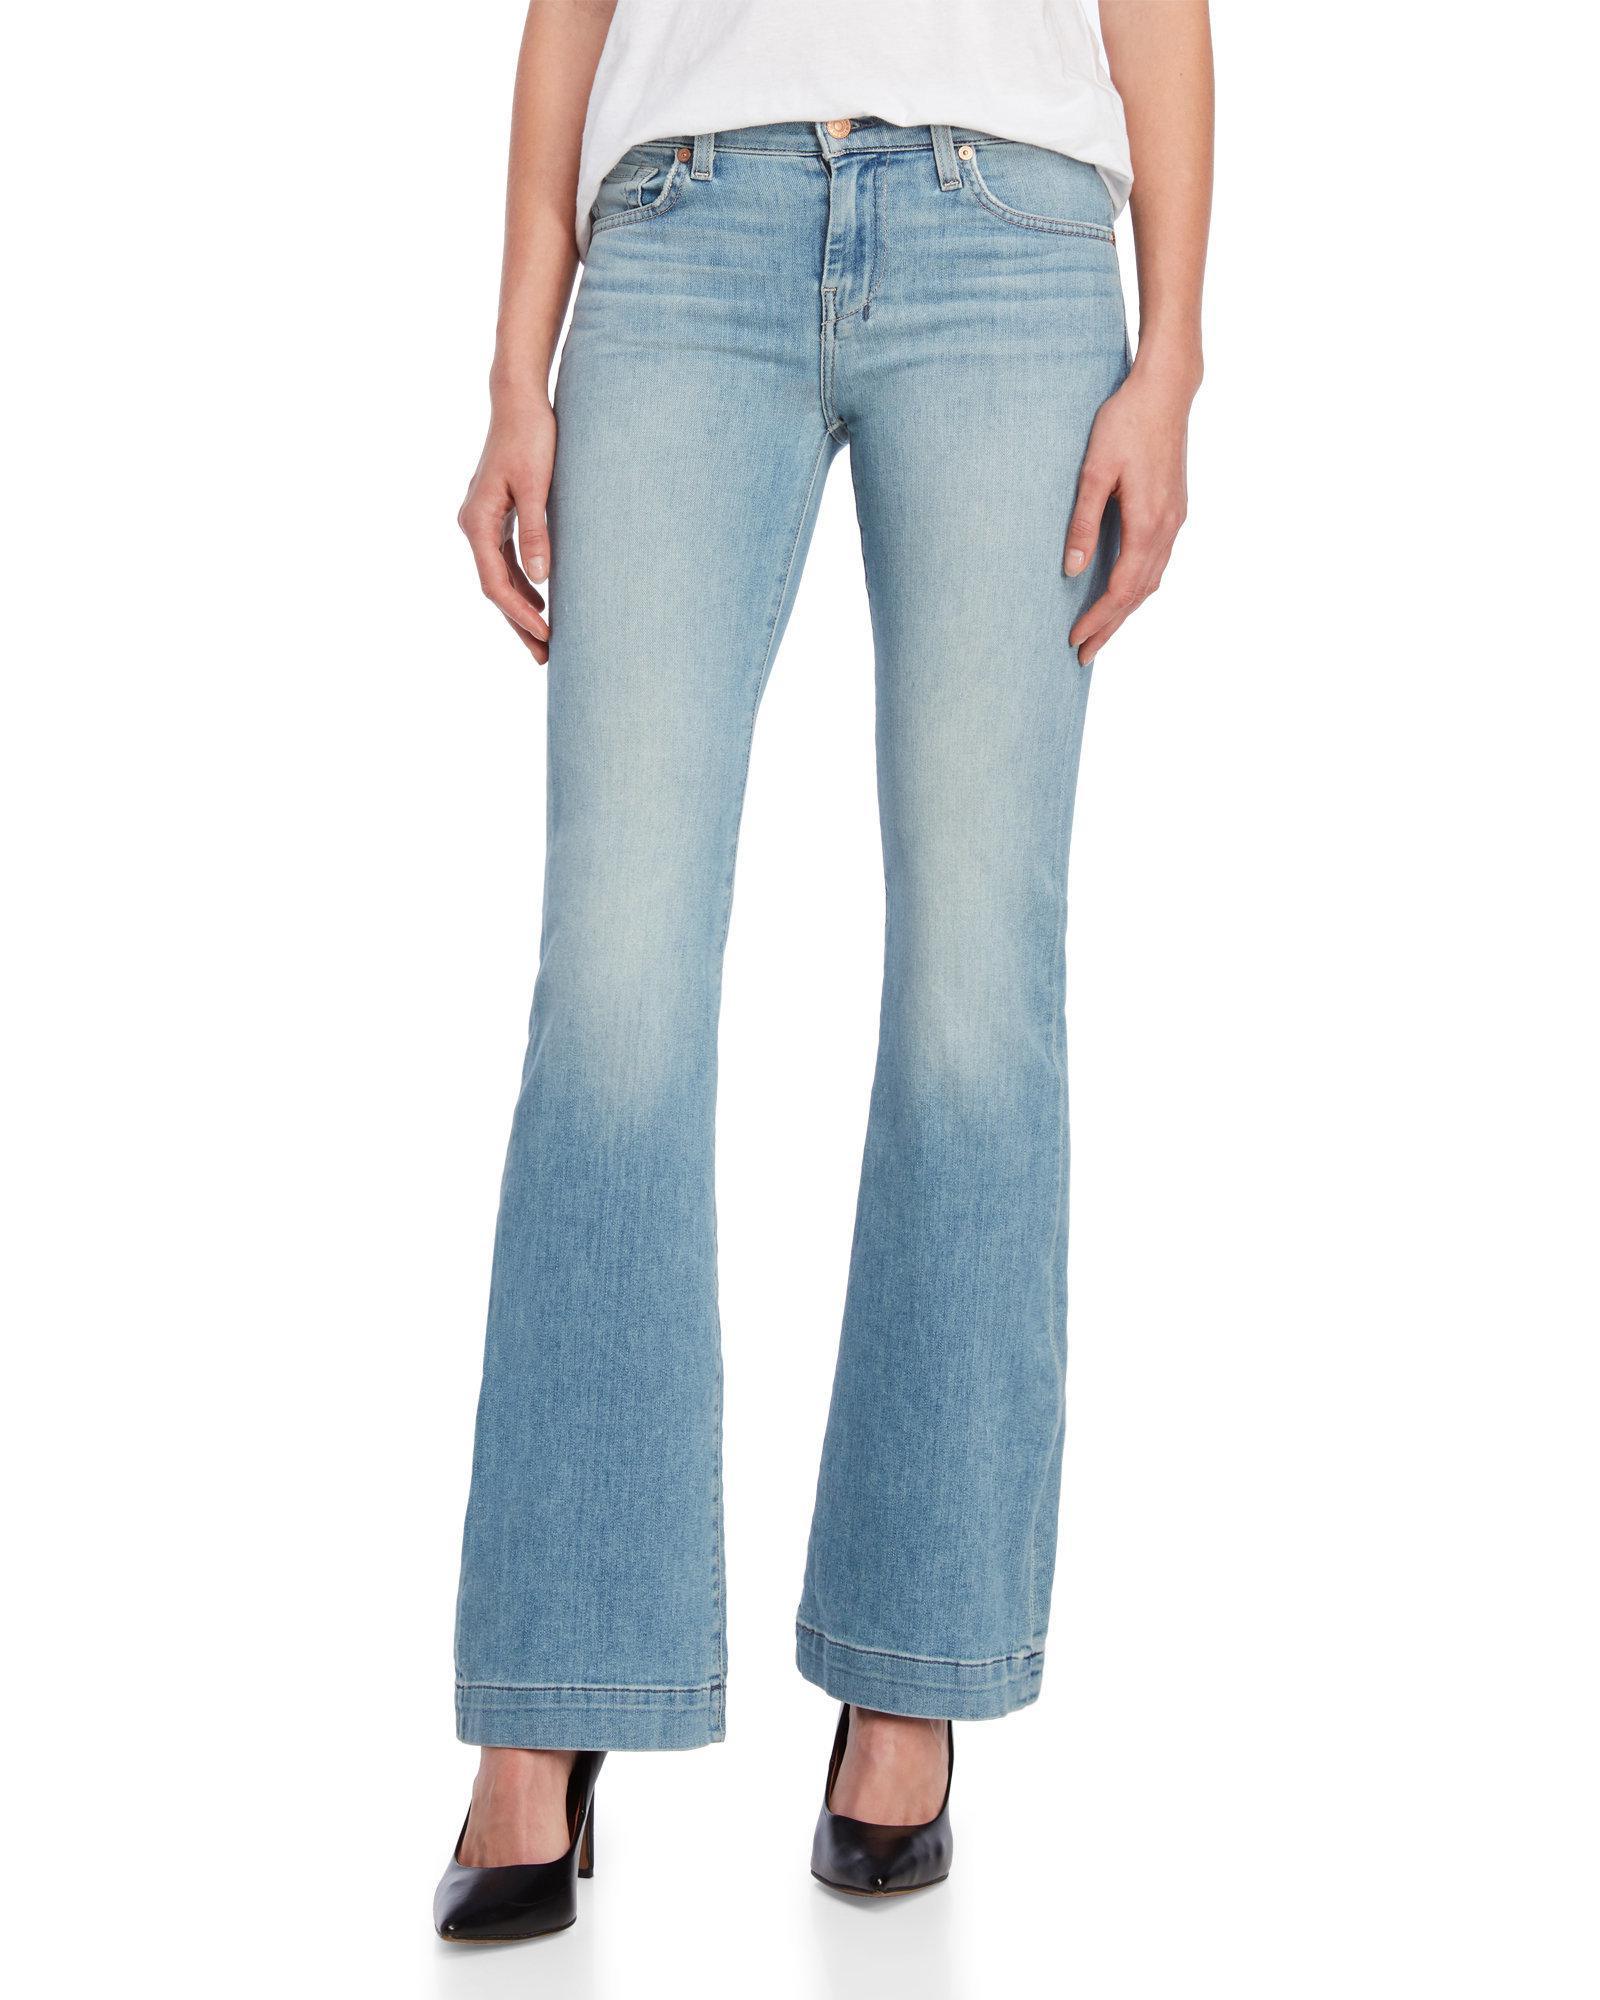 d26132db26 Lyst - 7 For All Mankind Dojo Wide Leg Jeans in Blue